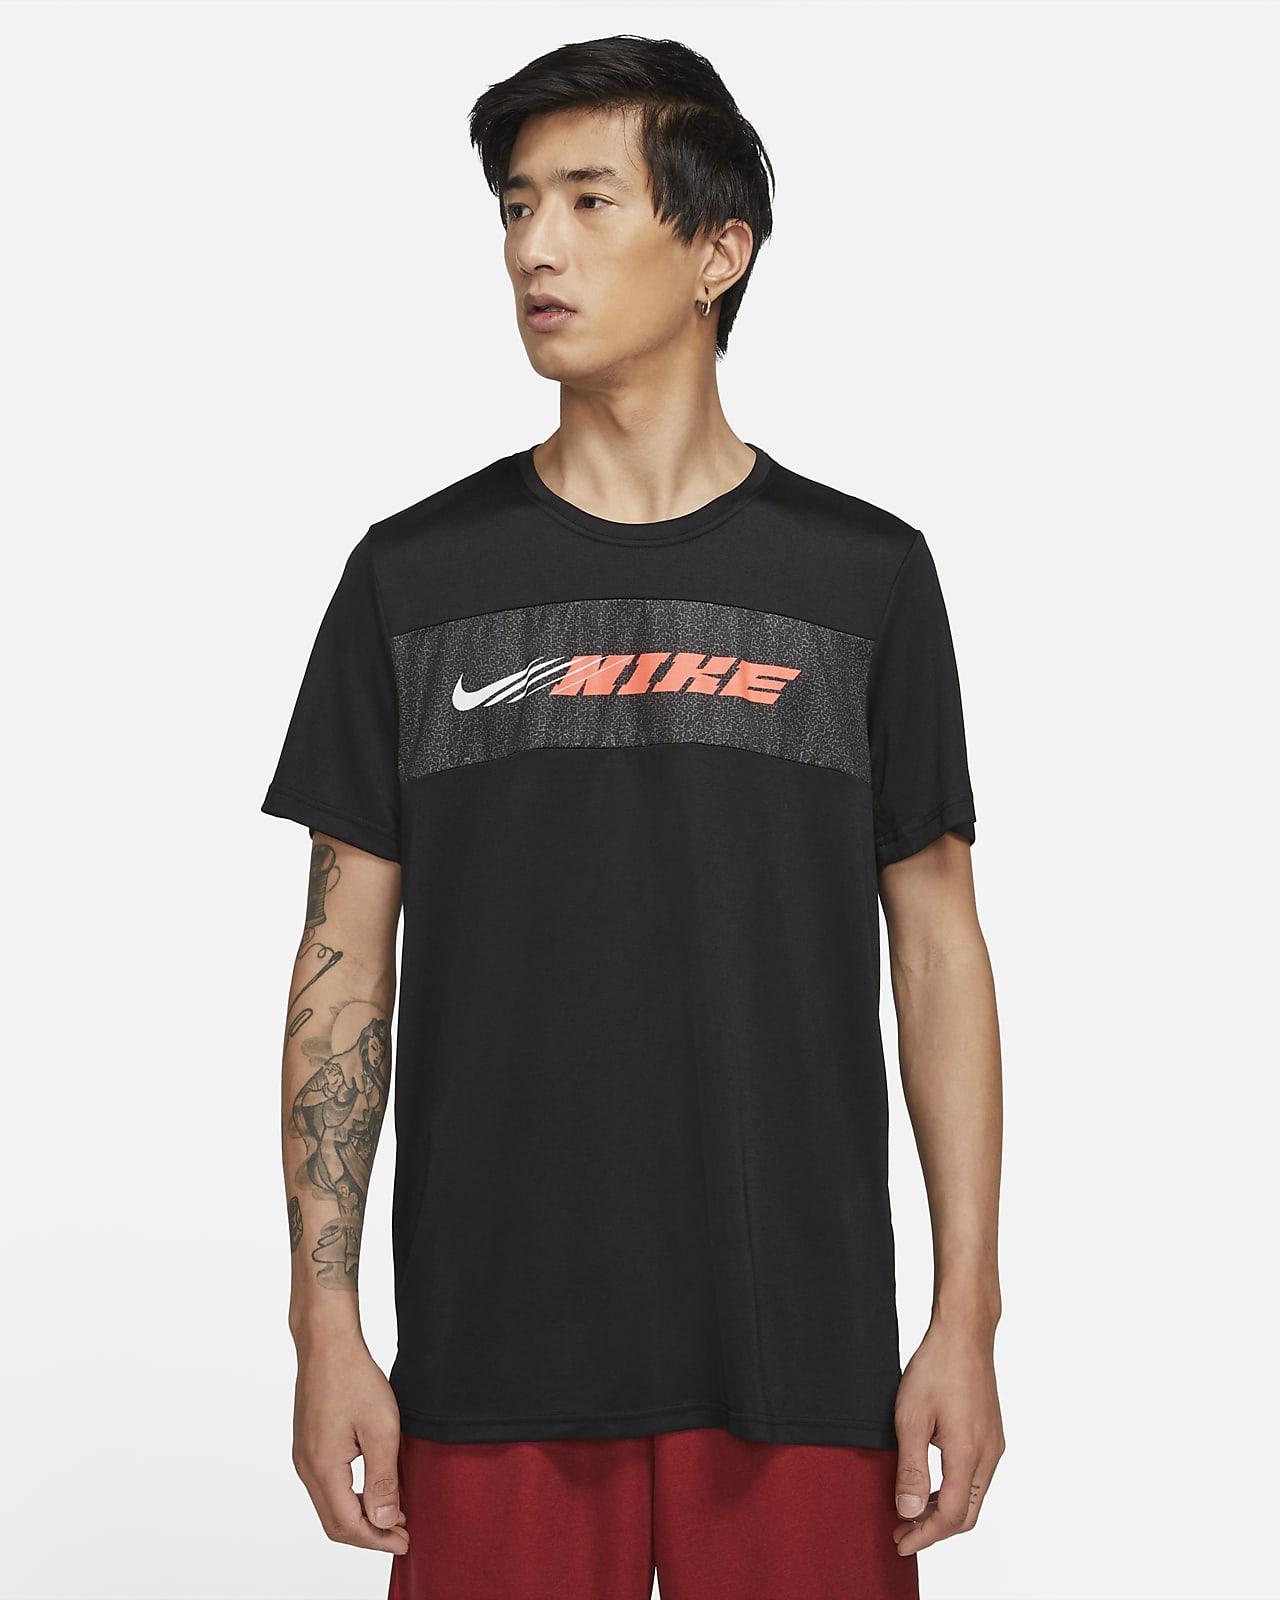 Męska koszulka treningowa z krótkim rękawem Nike Dri-FIT Superset Sport Clash